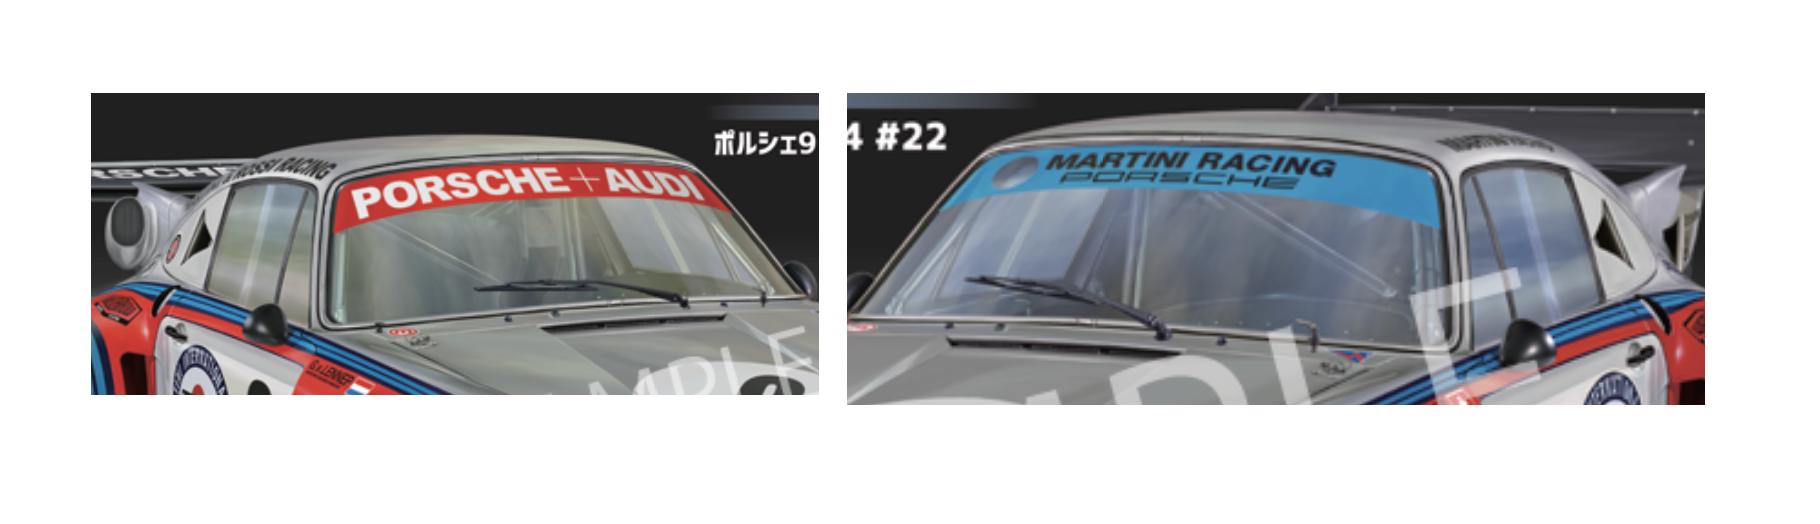 Outer window scraper Saab 900 up to 1980 - Saab 99 up to 1977 window swiper